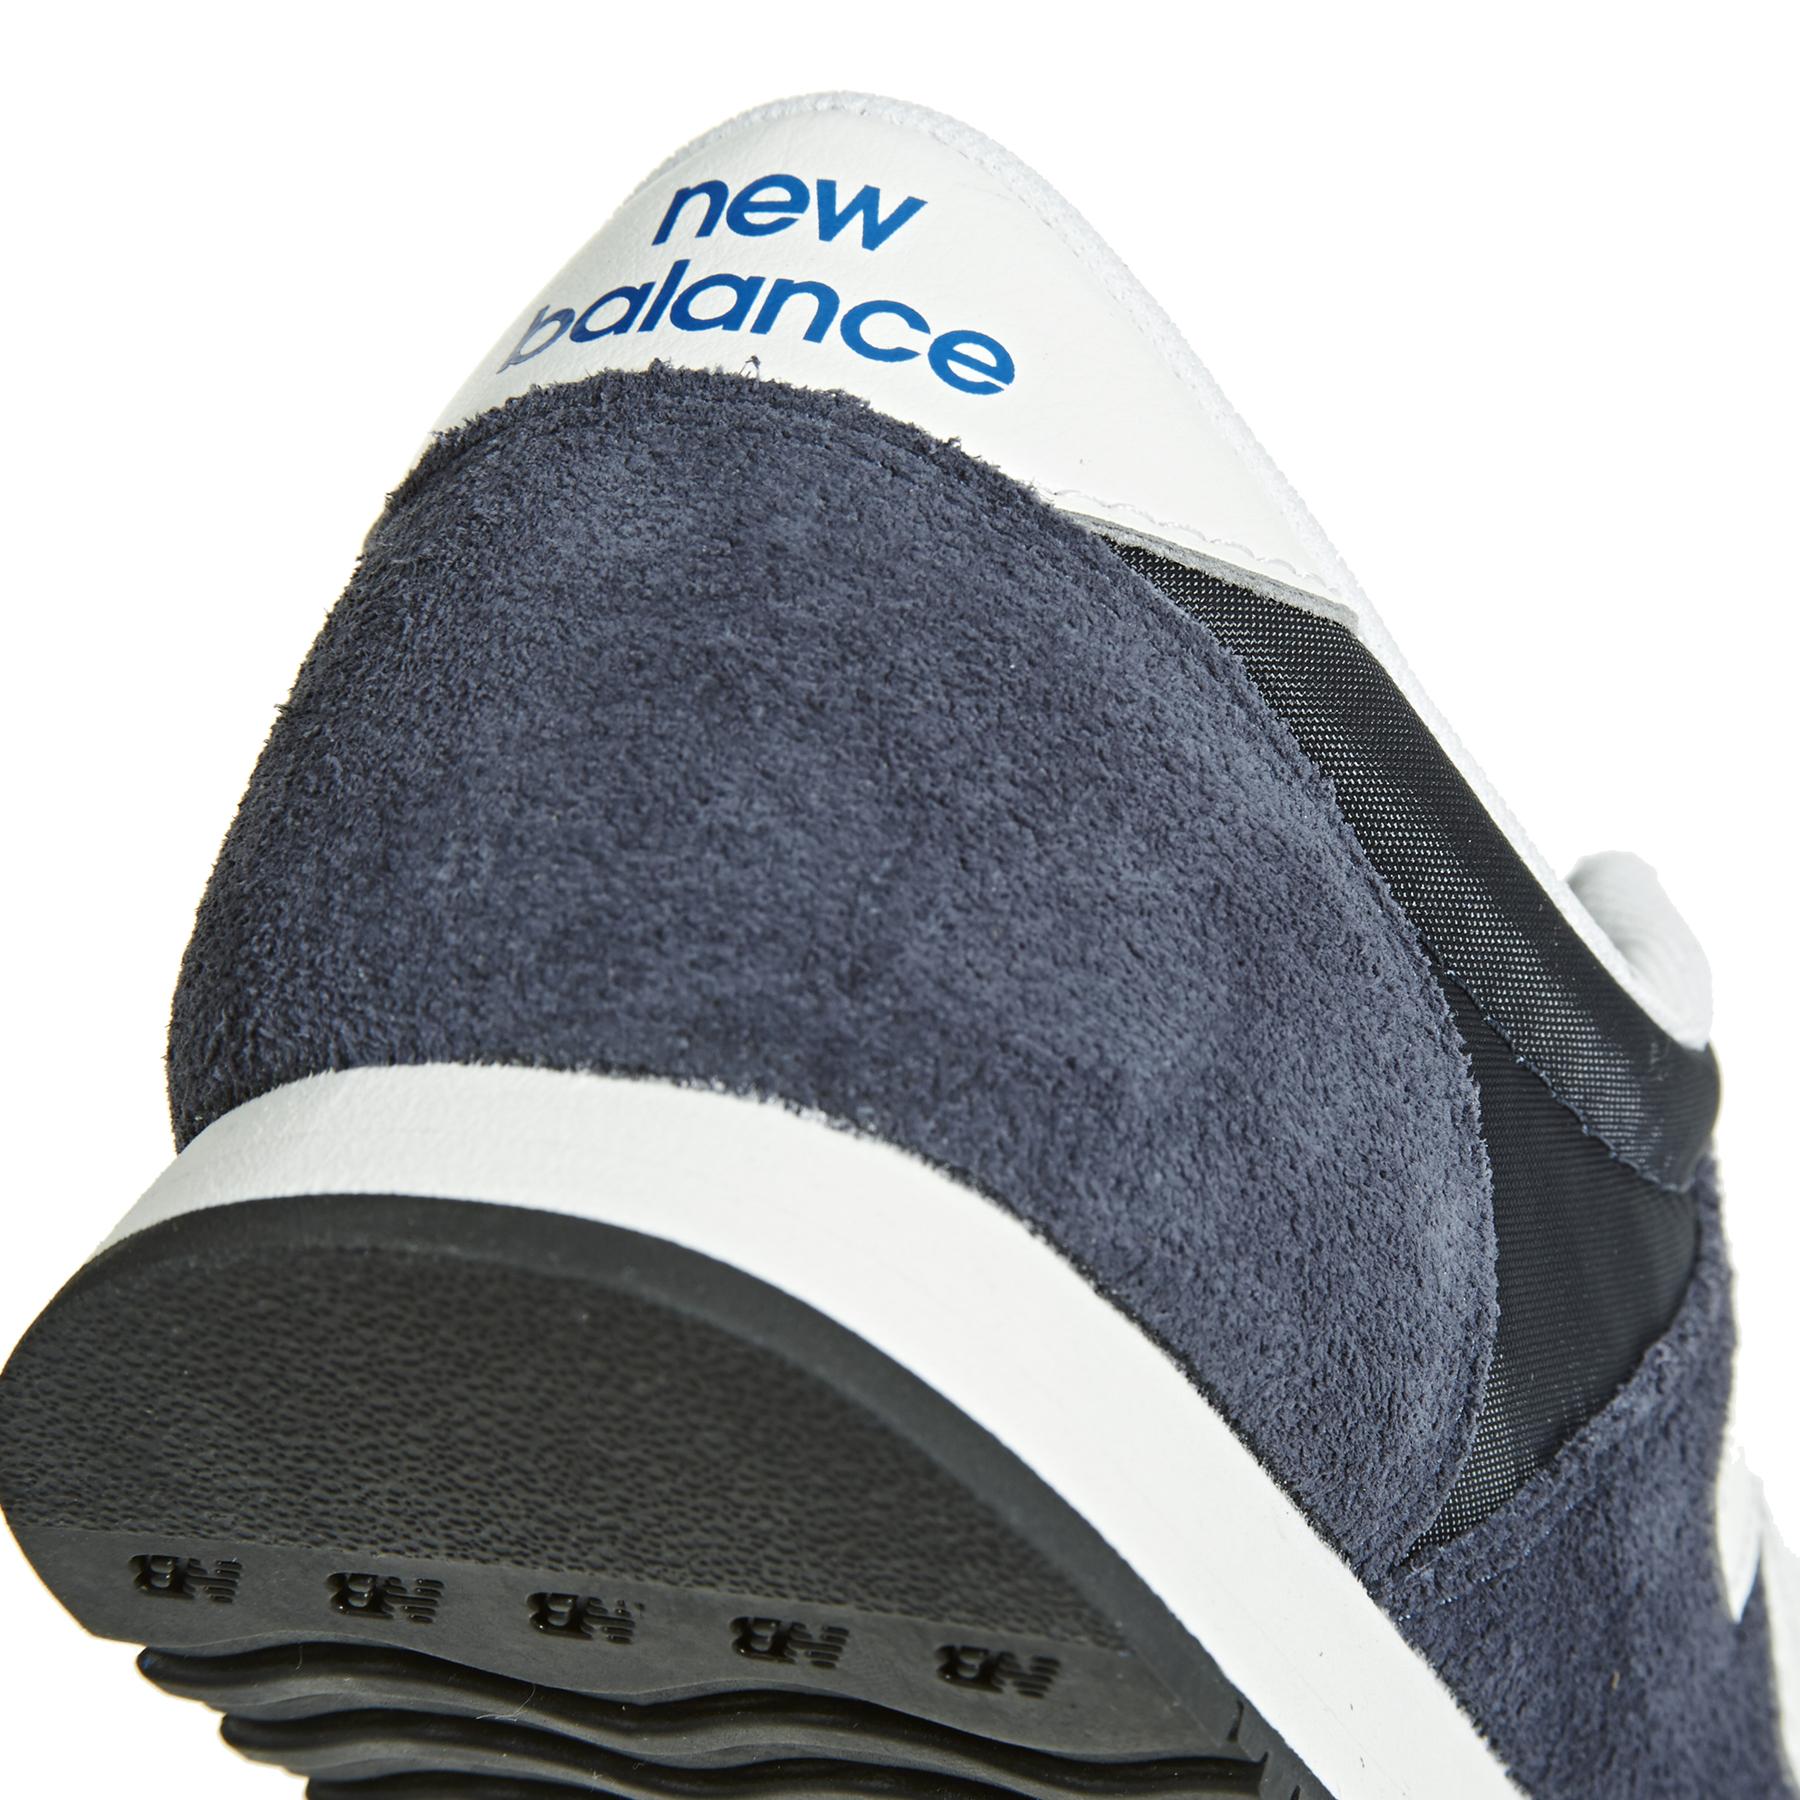 new balance 37.5 basket